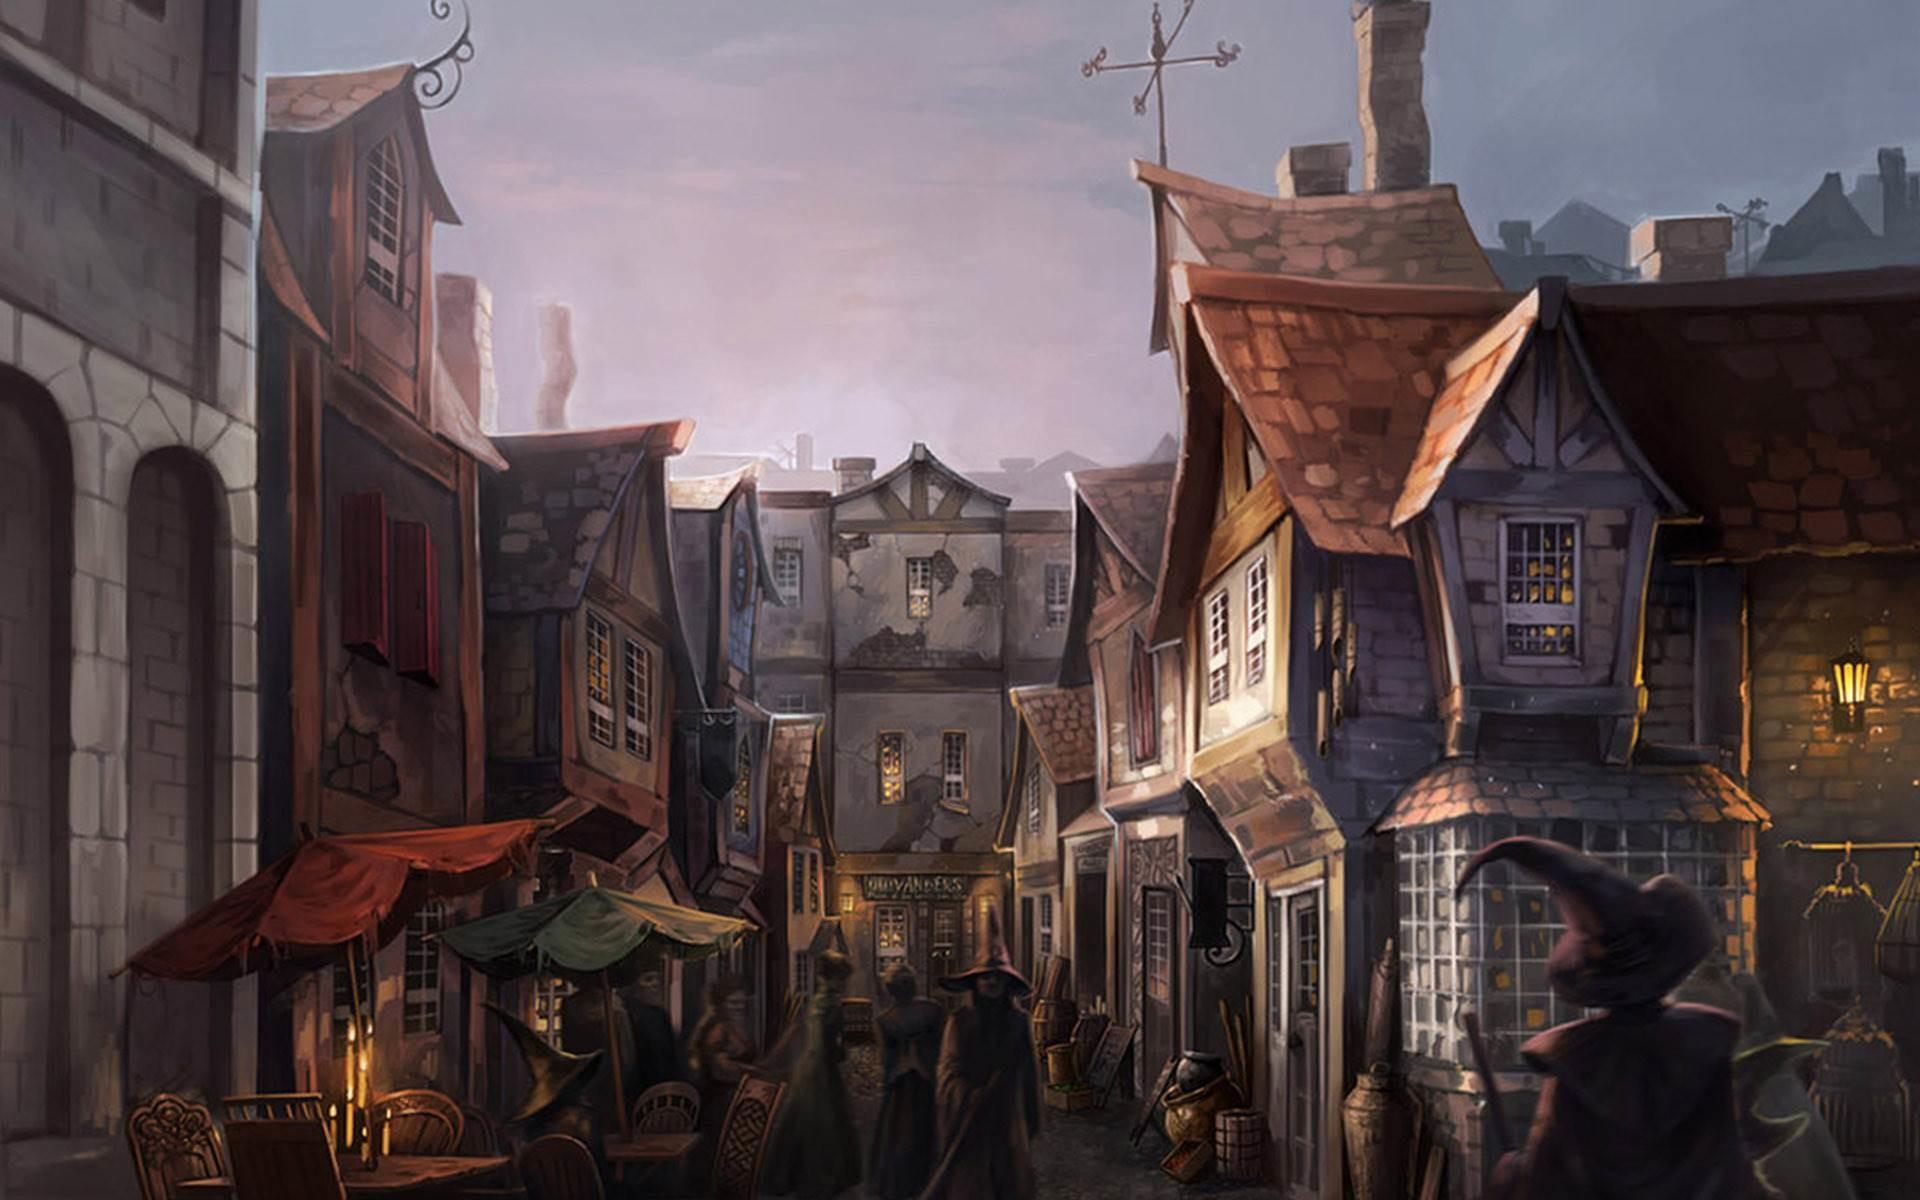 Most Inspiring Wallpaper Harry Potter Autumn - 414318-popular-harry-potter-desktop-backgrounds-1920x1200-pc  Pictures_12694.jpg